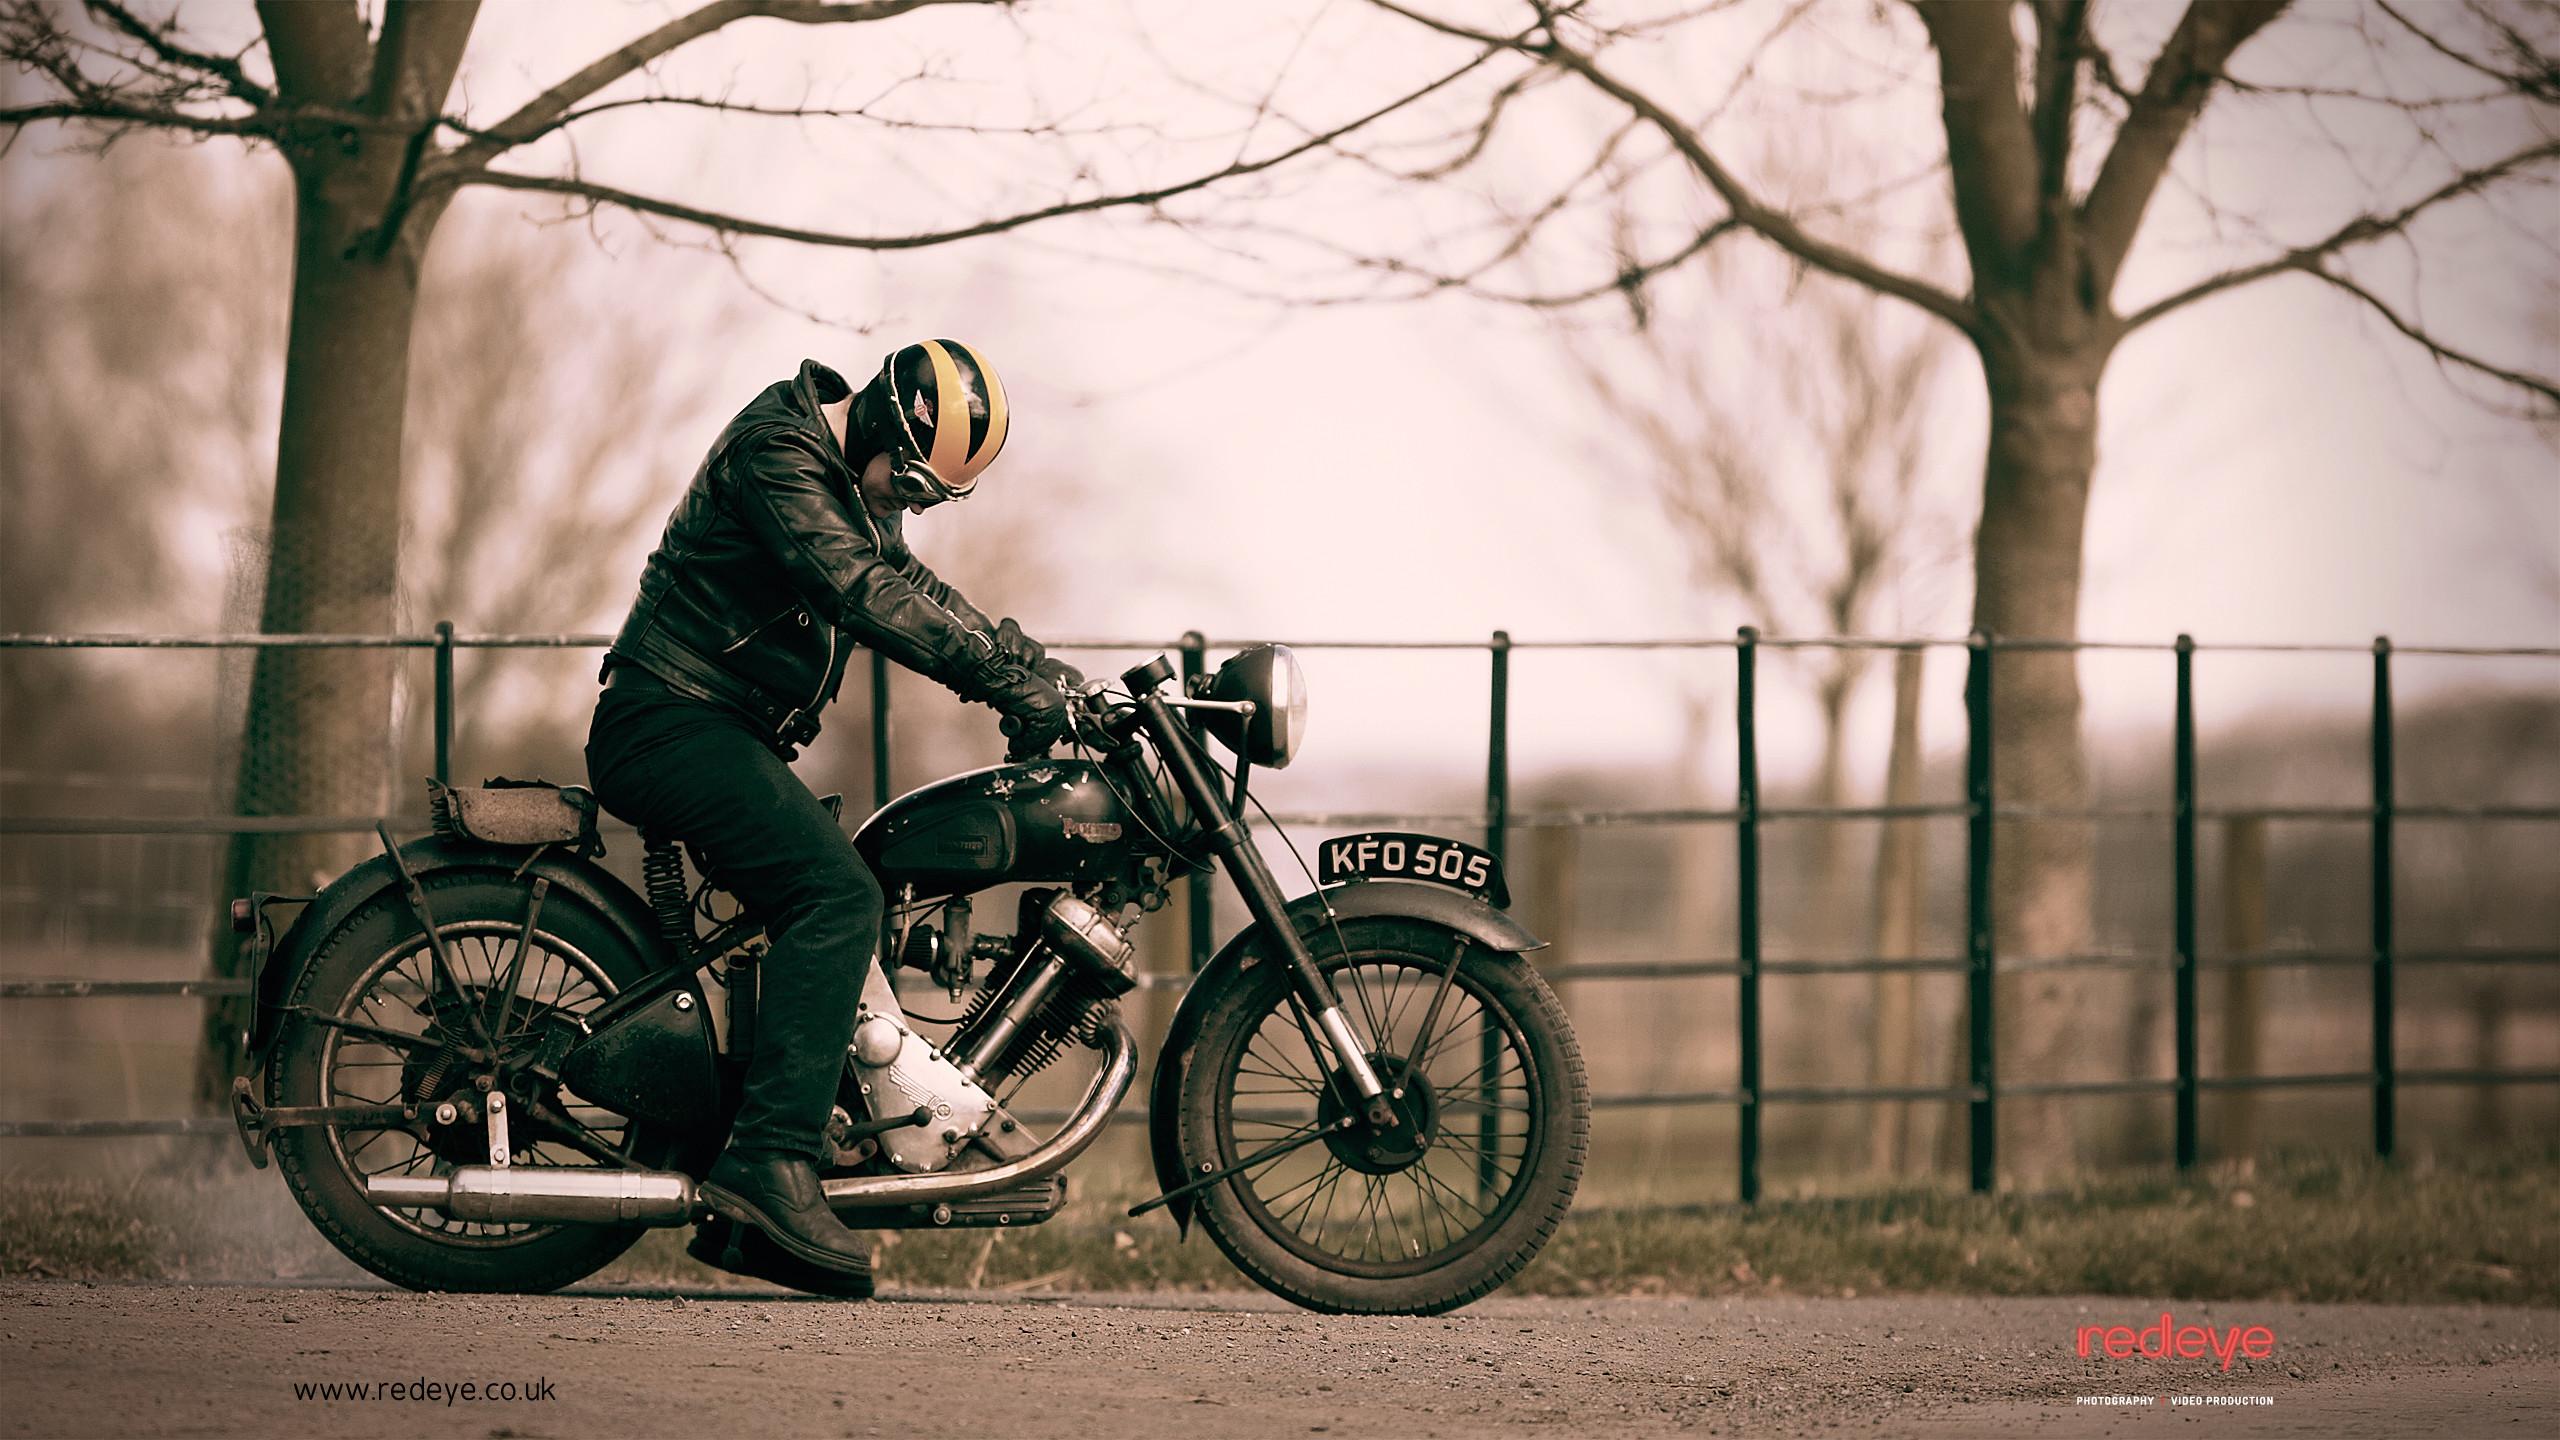 Res: 2560x1440, Classic Bike wallpaper 1300168